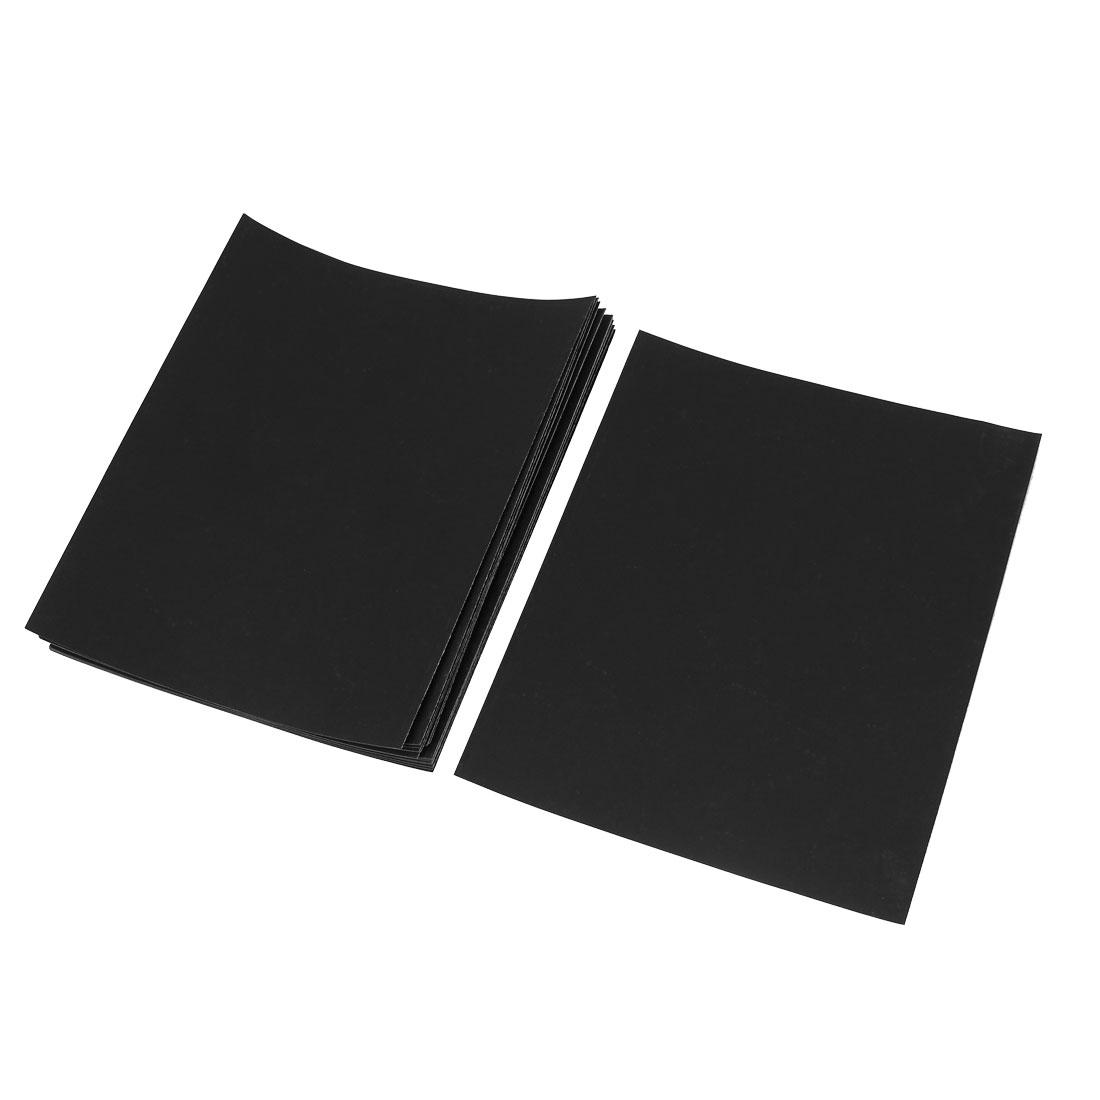 Manual Silicone Carbide Abrasive Sandpaper Sheets 800 Grit 20 Pcs